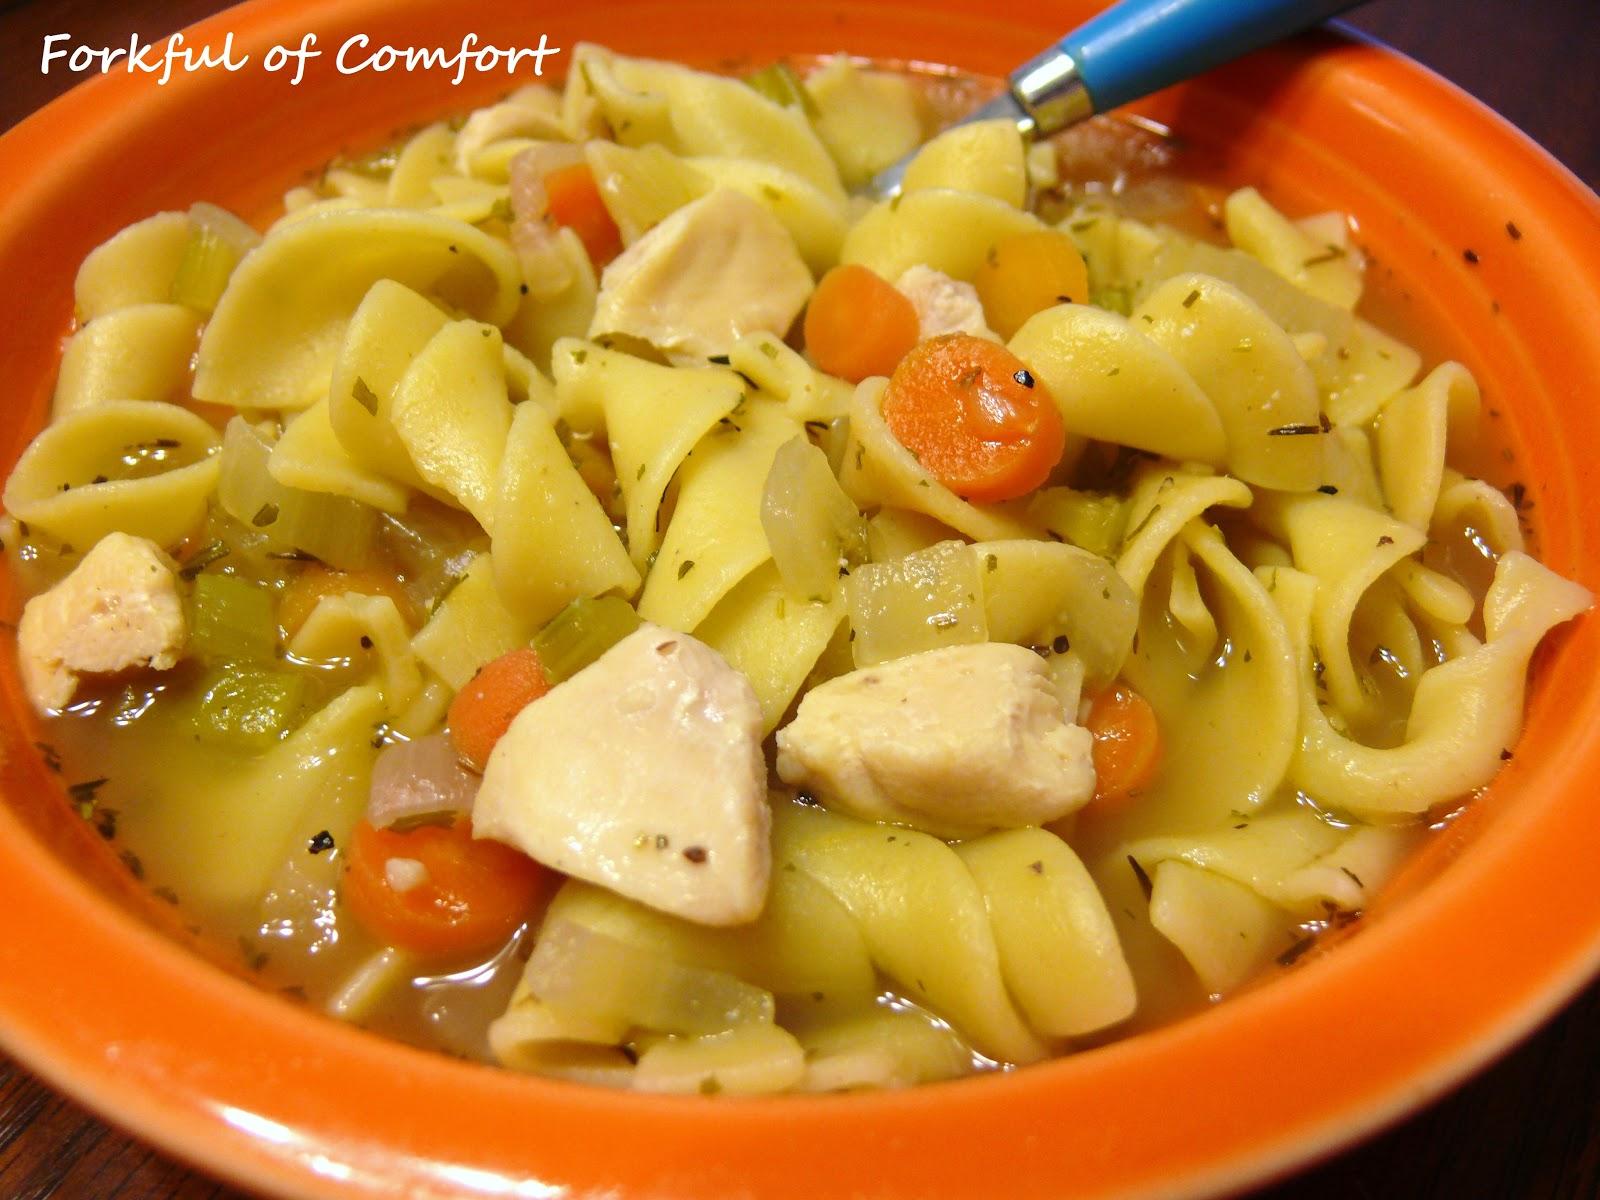 Forkful of Comfort: Chicken Noodle Soup